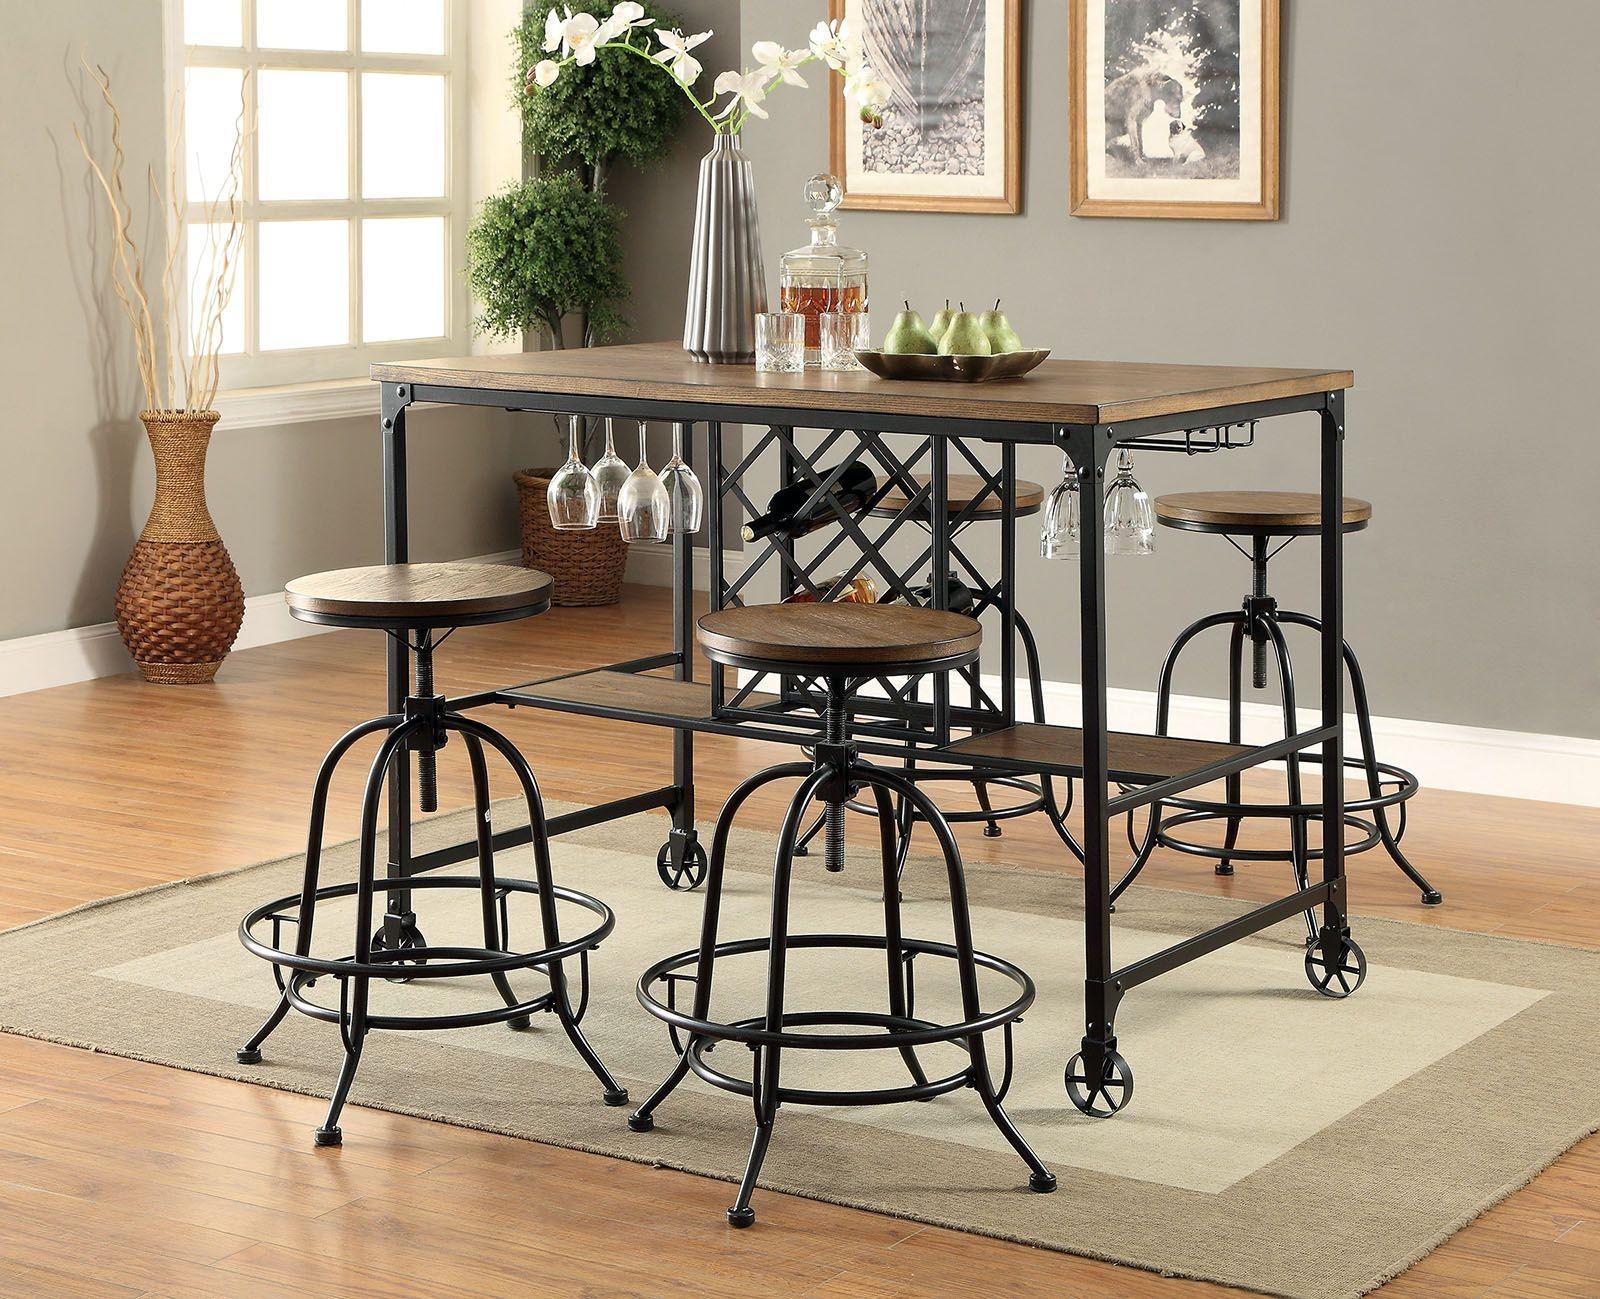 silvia i medium oak counter height dining room set cm3803pt furniture of america. Black Bedroom Furniture Sets. Home Design Ideas